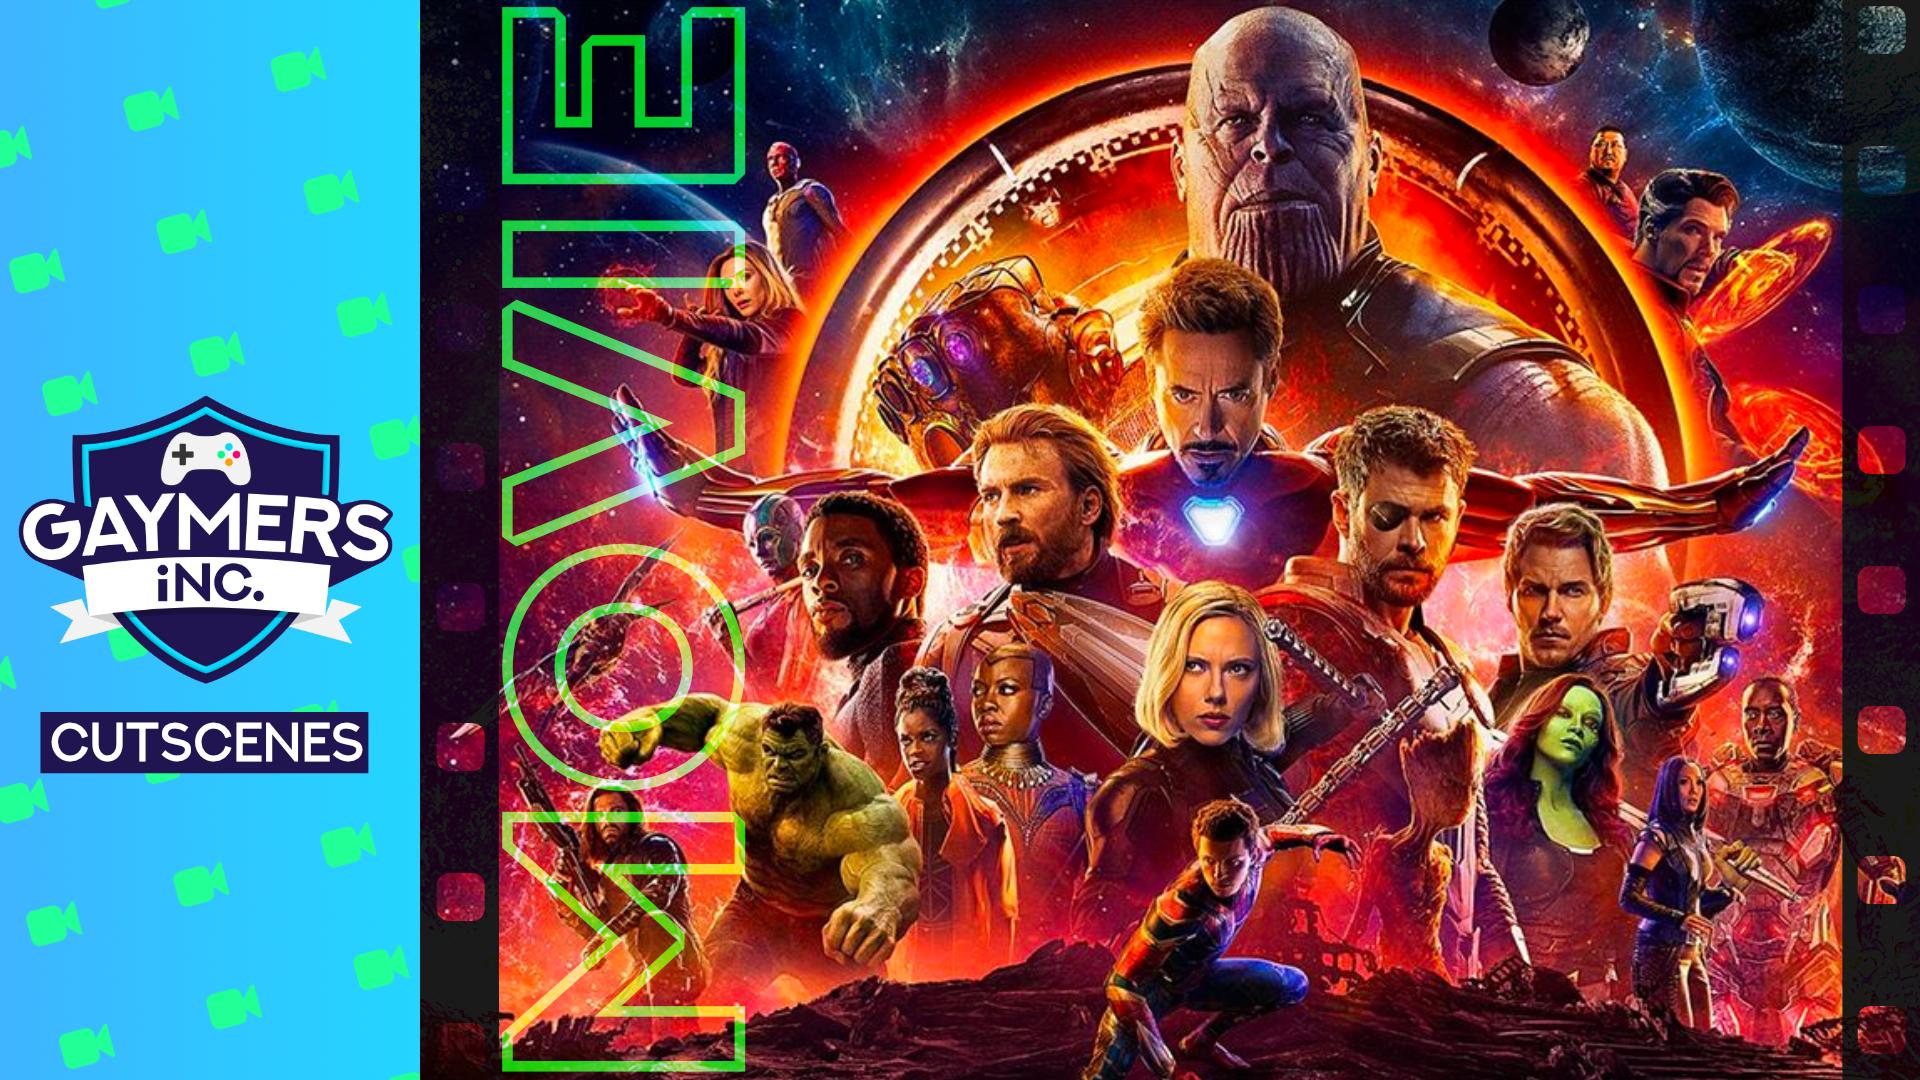 Avengers: Infinity War - Gaymers iNC.